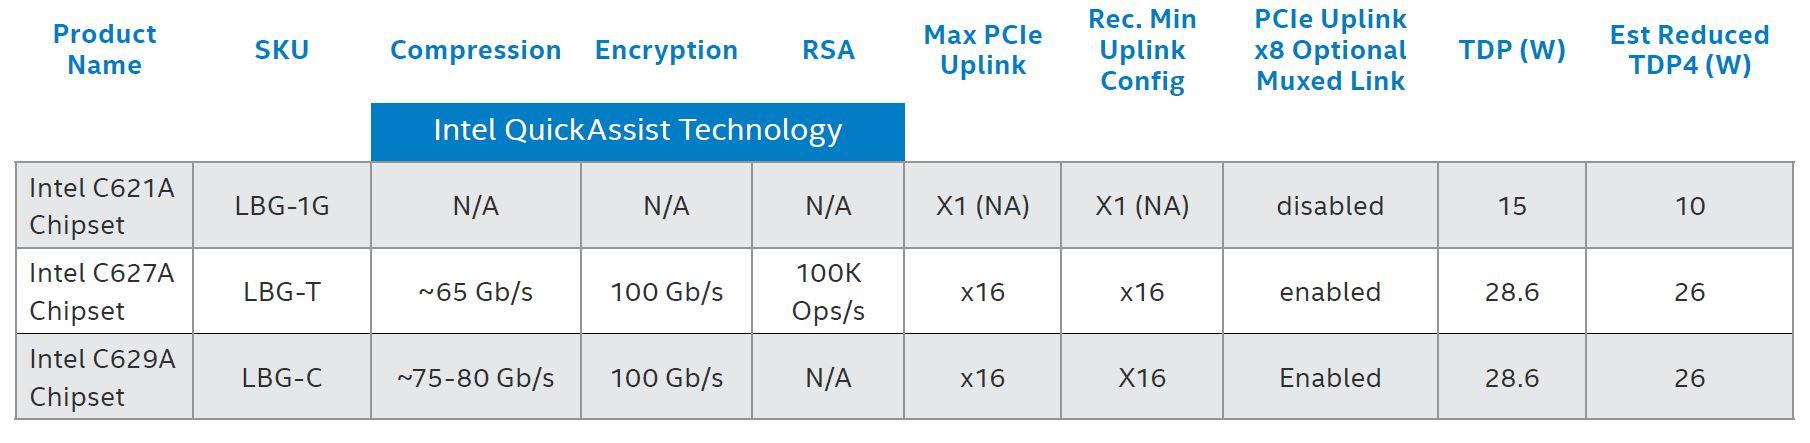 3rd Generation Intel Xeon Scalable Lewisburg Refresh PCH